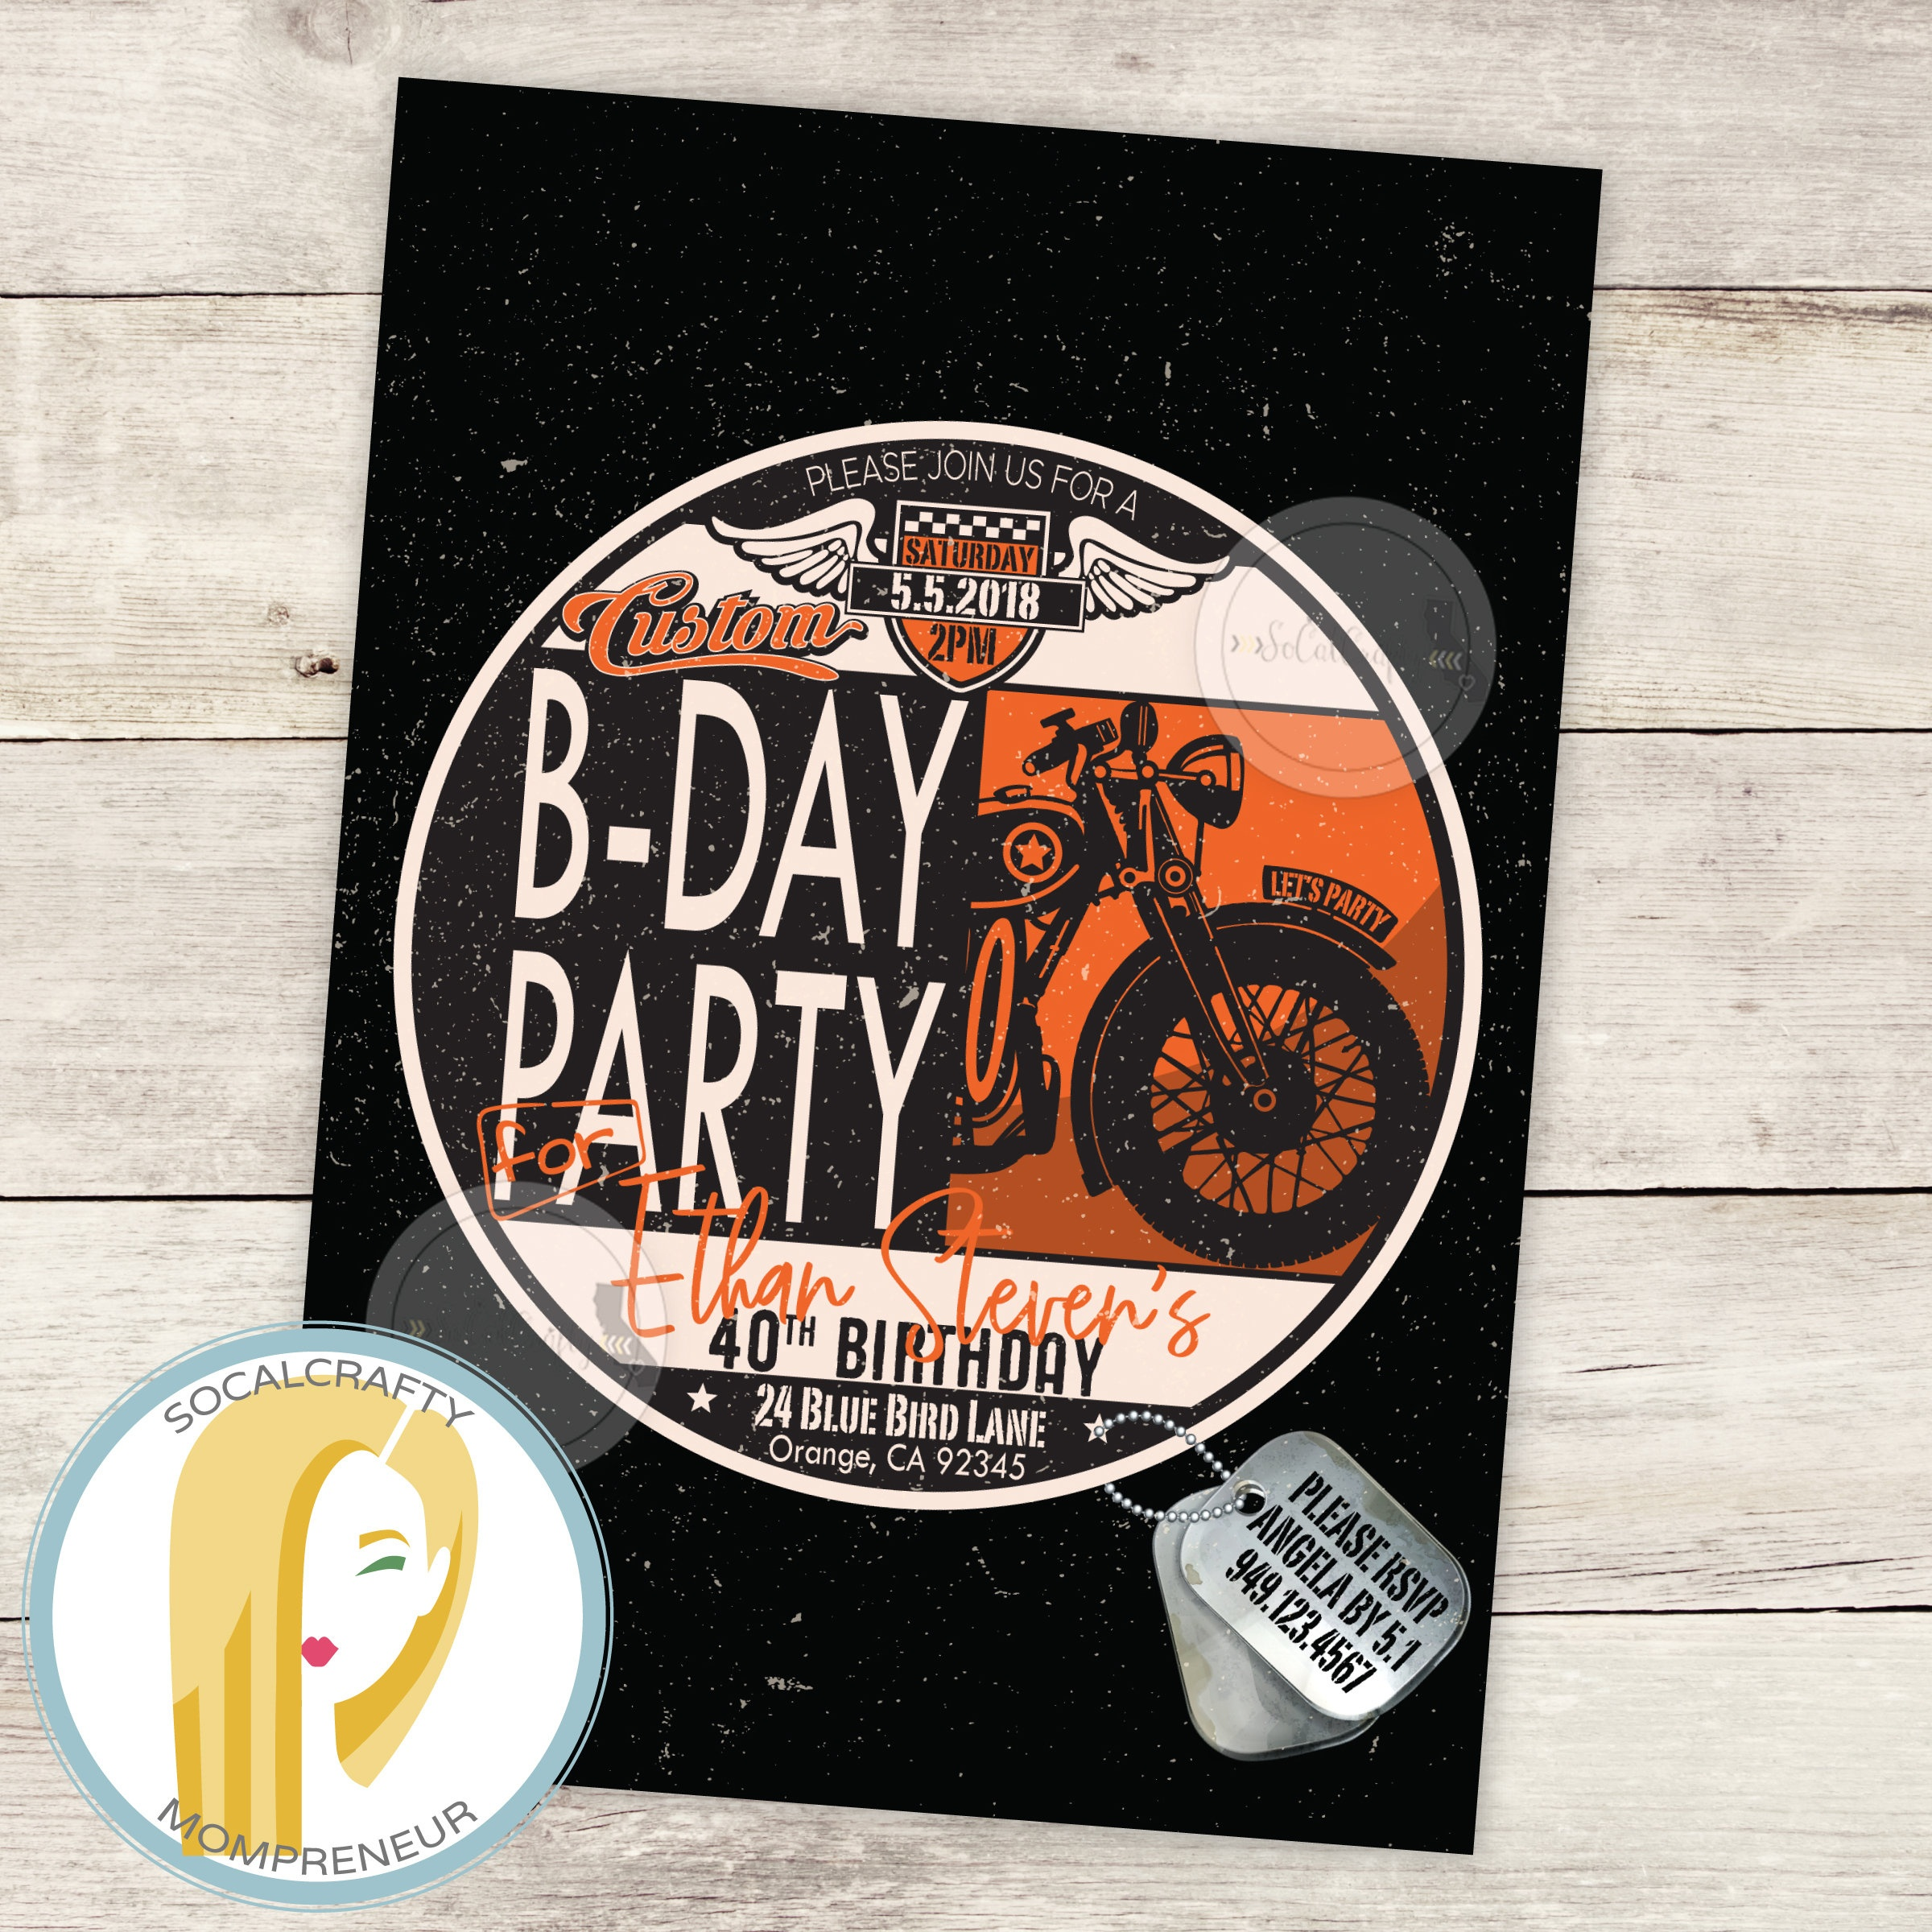 Harley Davidson Birthday Party Invitation Motorcycle | Etsy - Motorcycle Invitations Free Printable